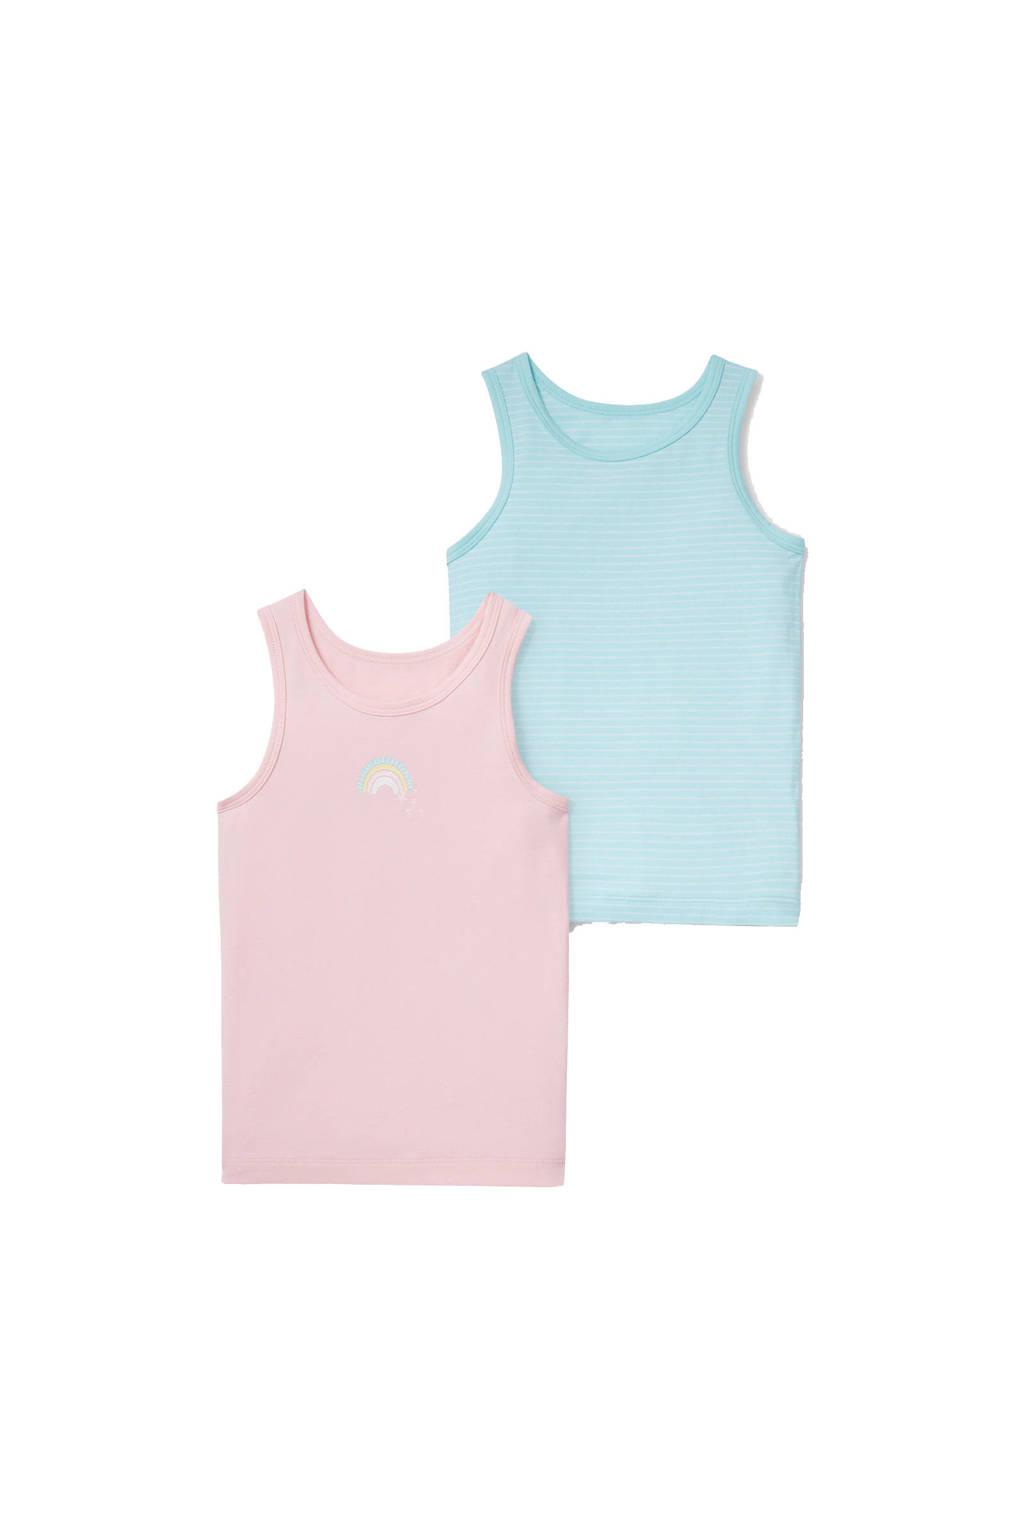 C&A Palomino hemd - set van 2 roze/turquoise, Roze/turquoise